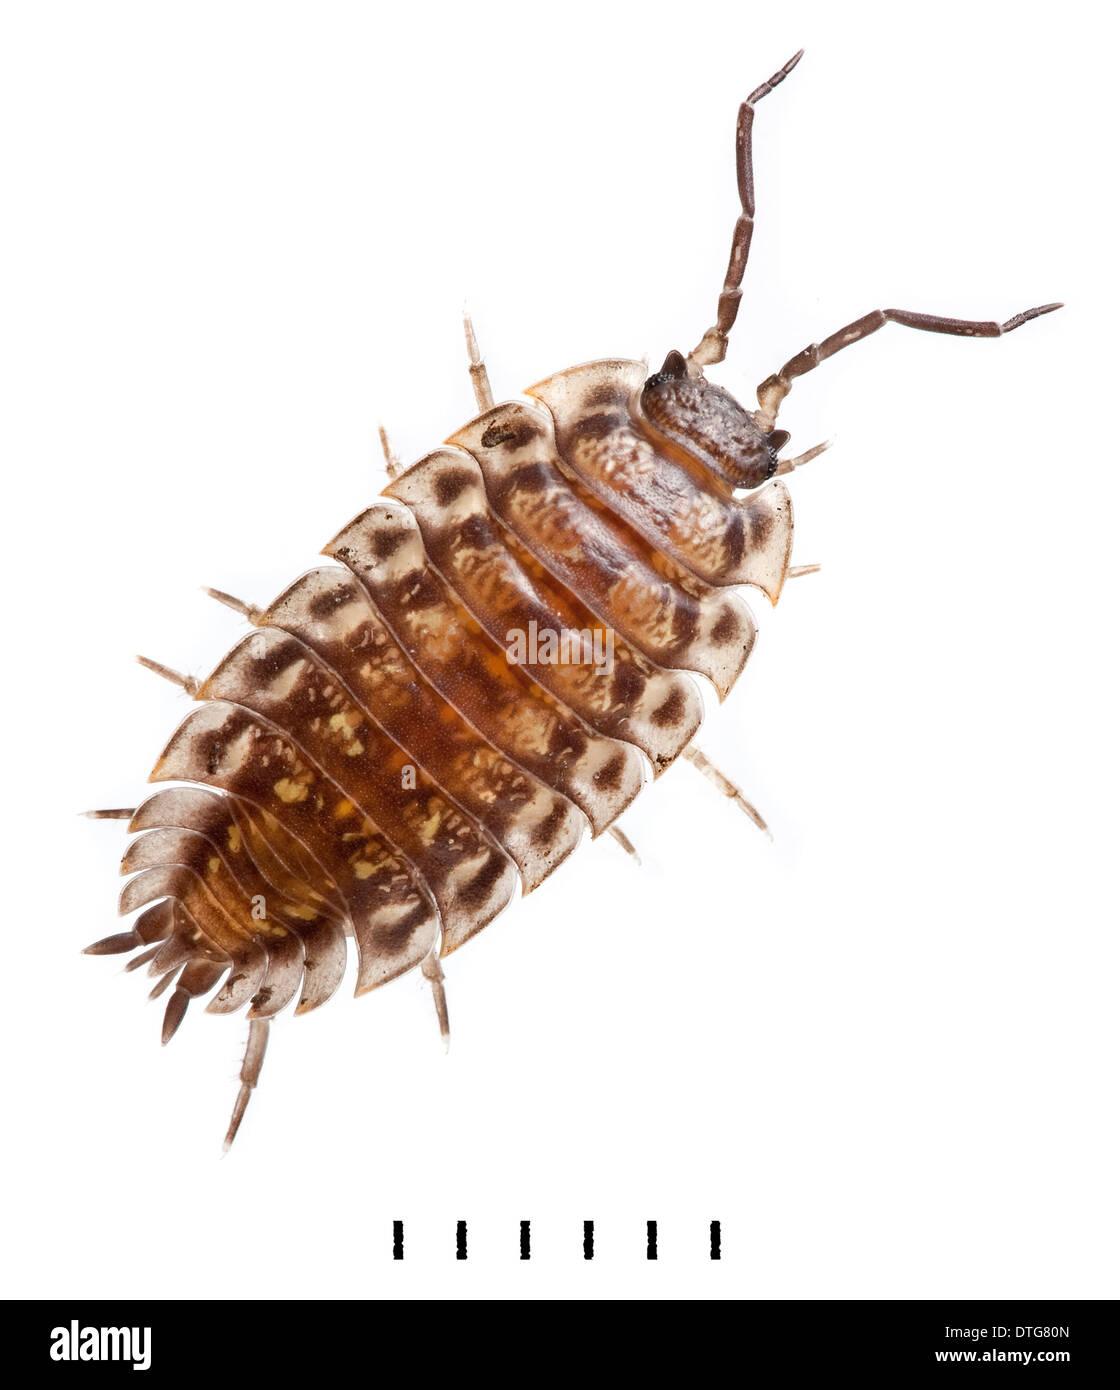 Oniscus asellus, Common Shiny Woodlouse - Stock Image